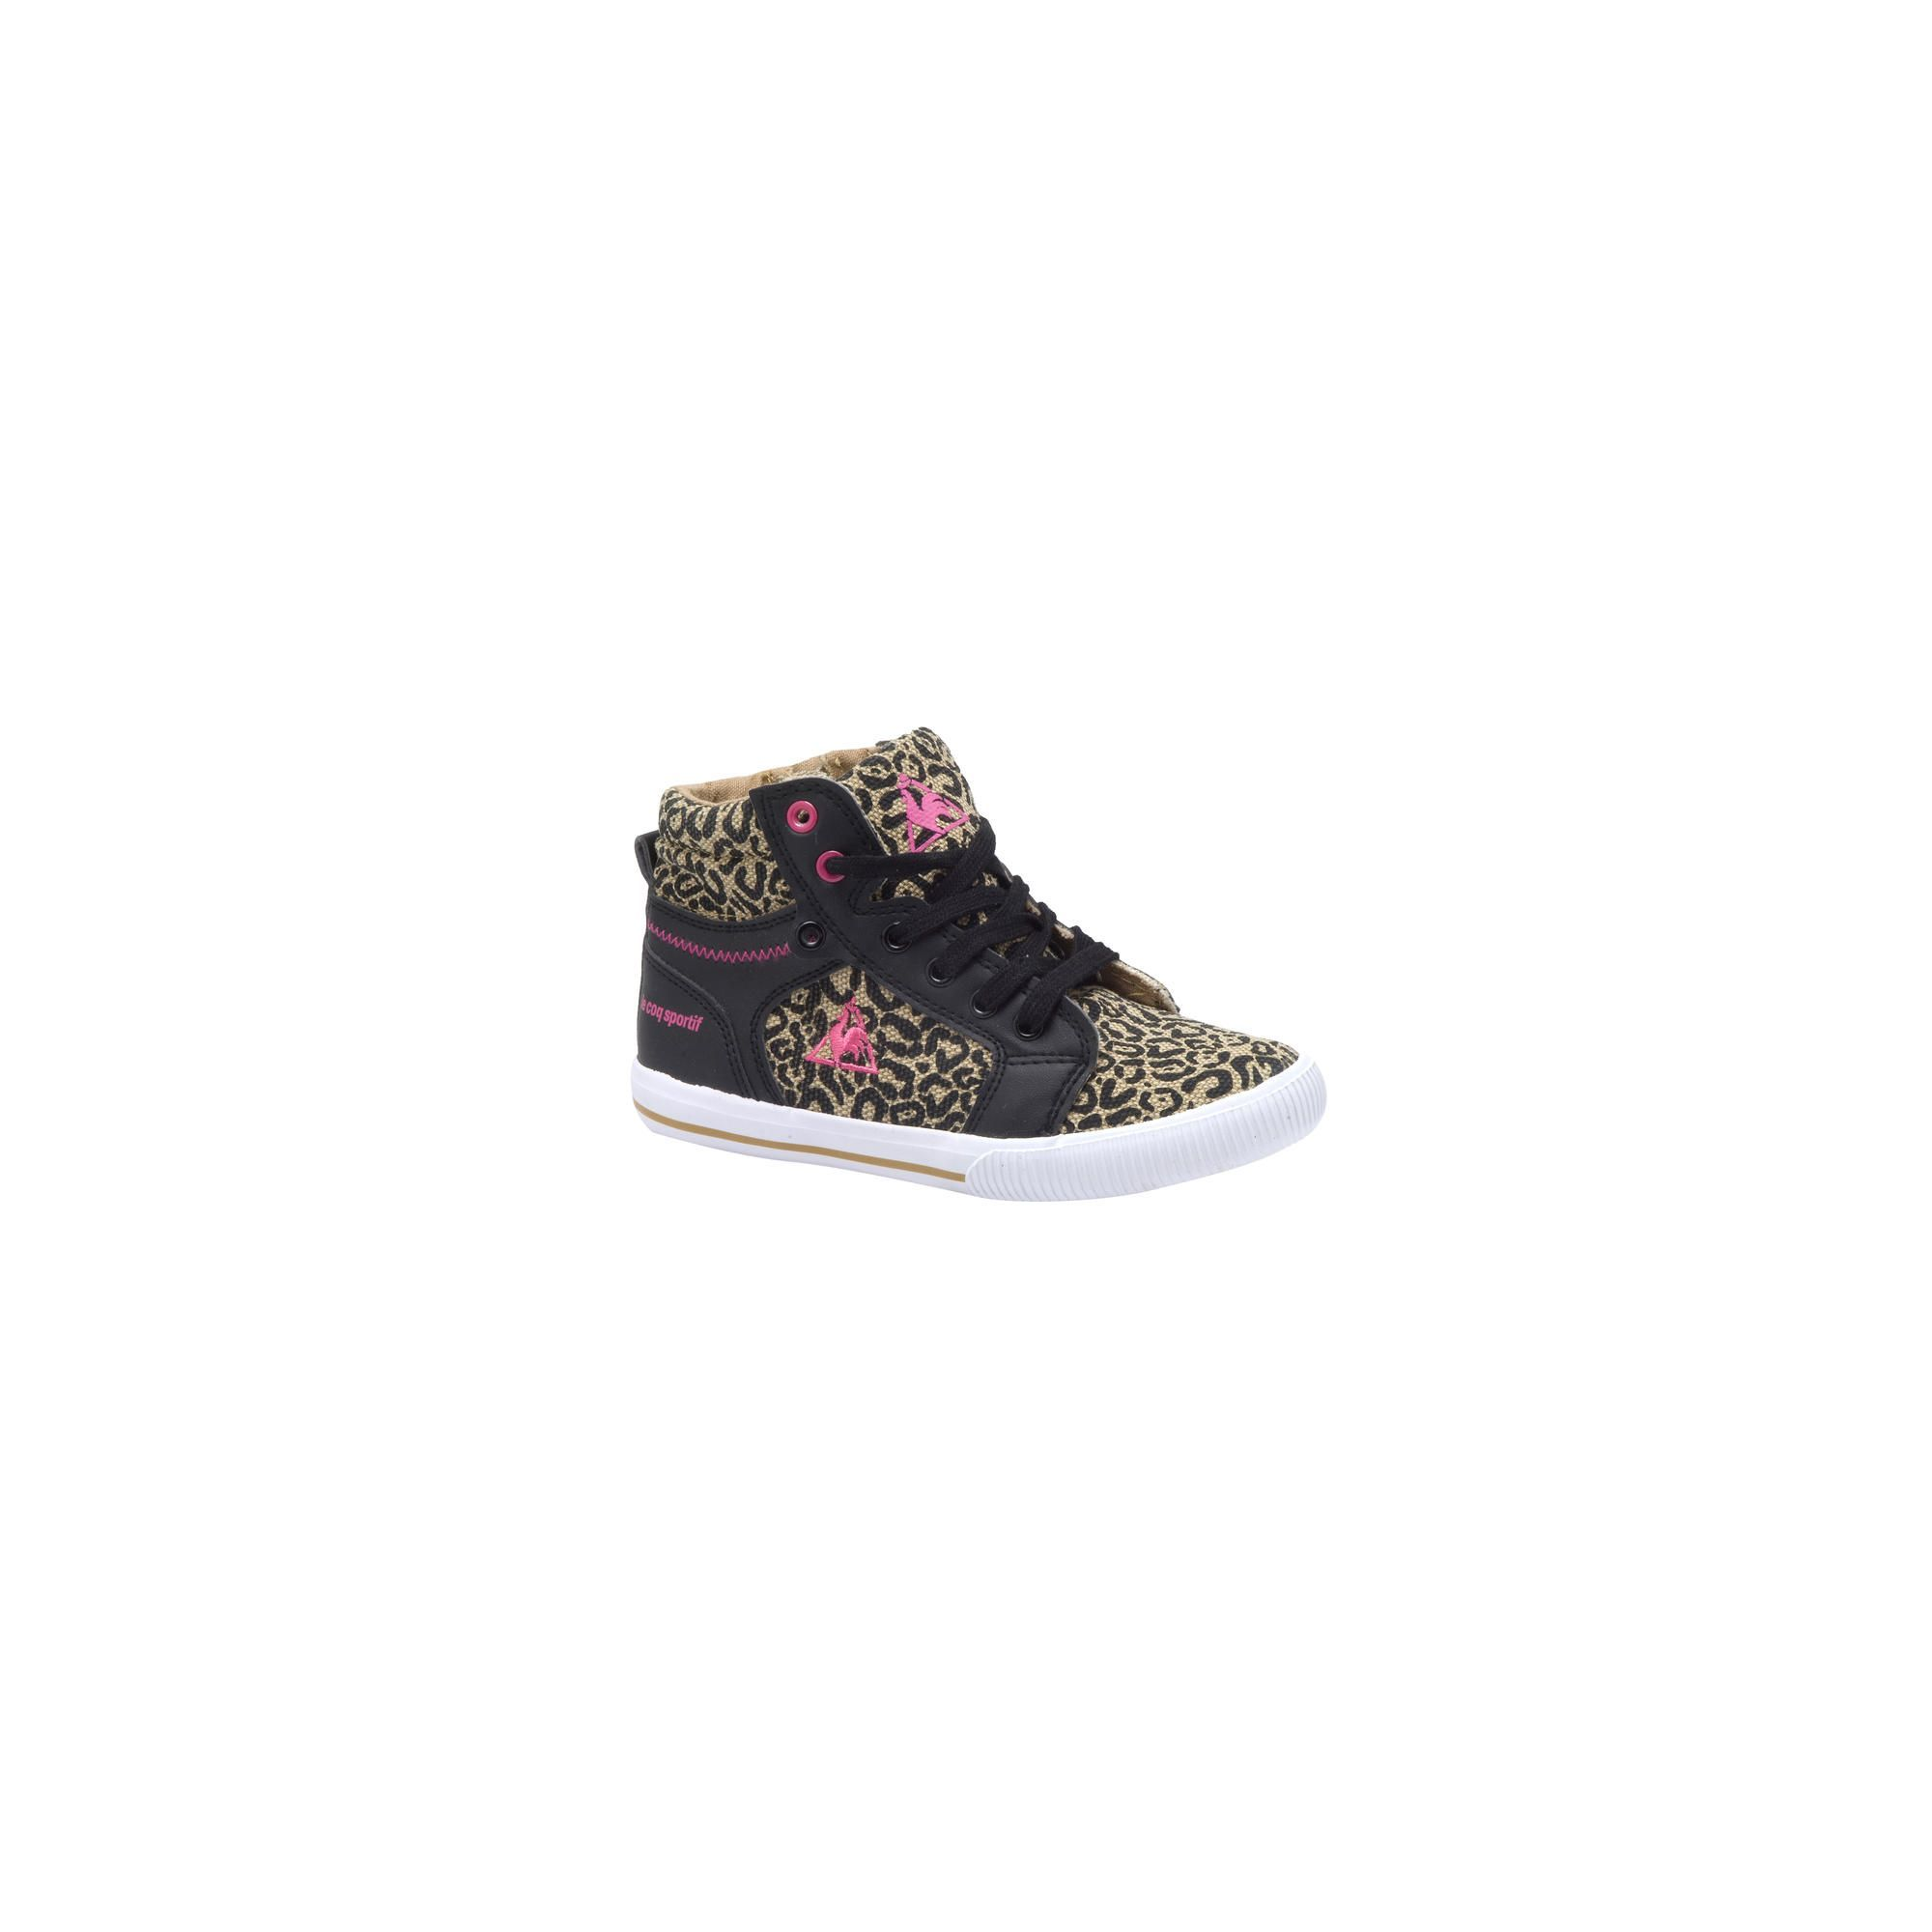 Hippe Le coq sportif shammy mid ps (Bruin/roze) Sneakers van het merk Le coq sportif. Uitgevoerd in brown/pink.